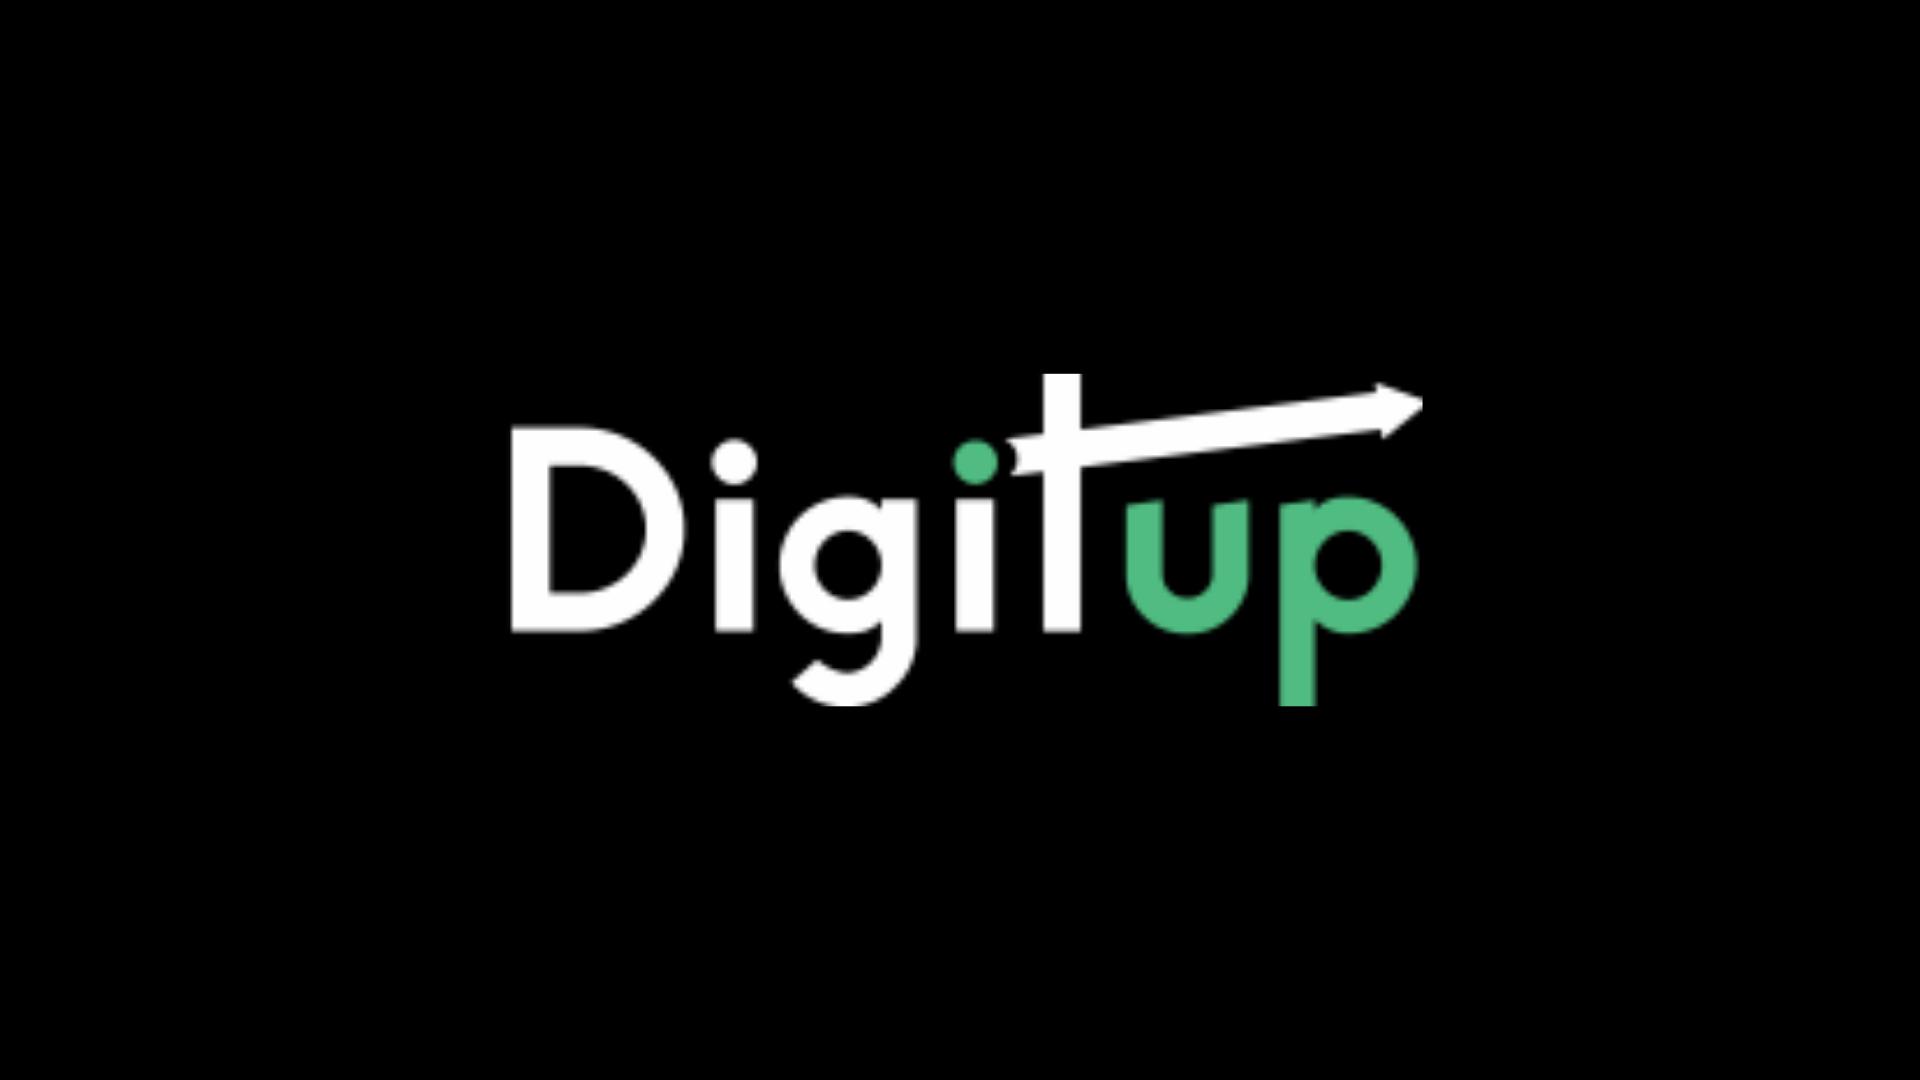 digitup marketing